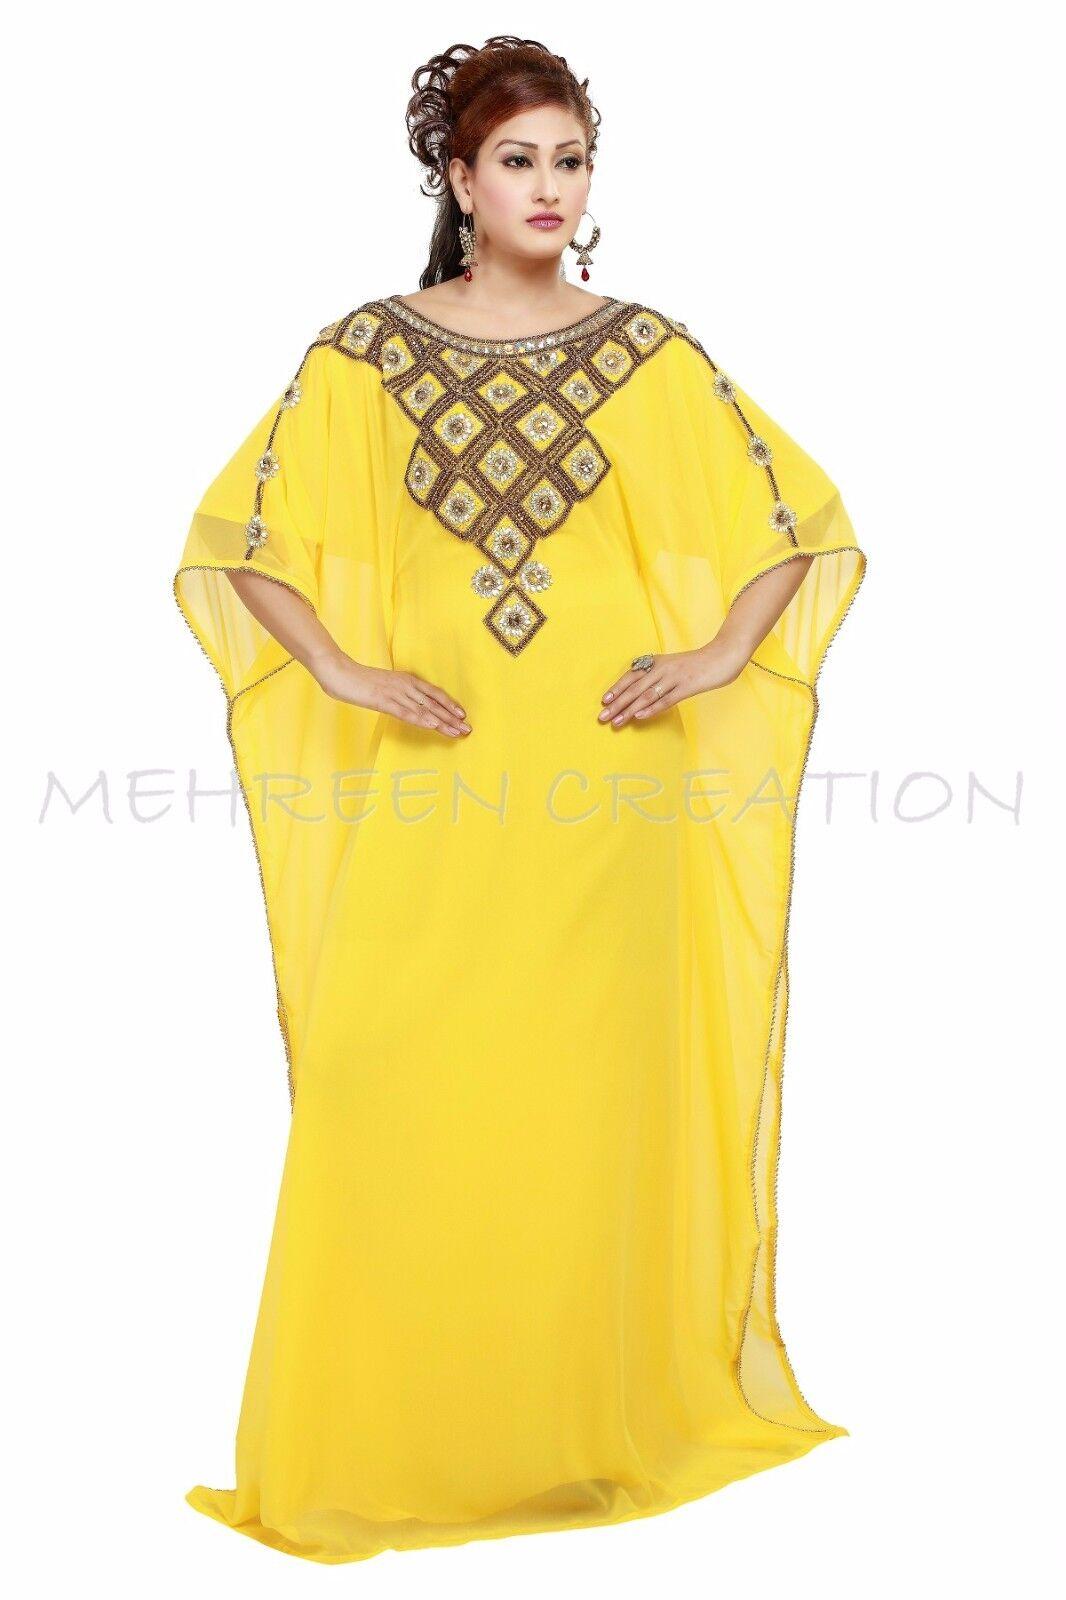 64a4da6980fdd3 MODERN DUBAI FARASHA MgoldCCAN KAFTAN ABAYA JILBAB WOMEN TAKSHITA VAR 1093  ROYAL nnugkj527-Dresses